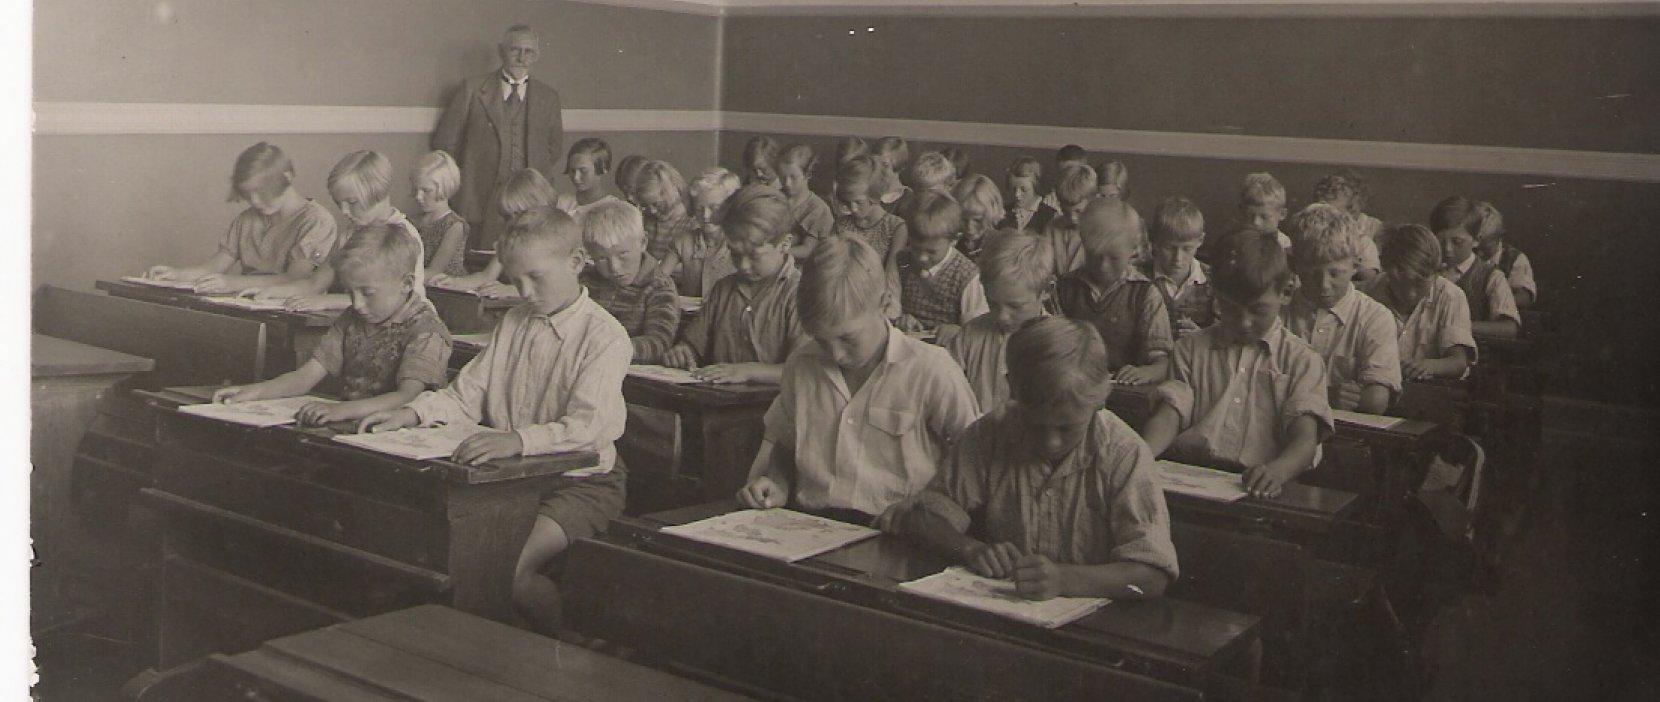 Klasse Gl Holte Skole 1932